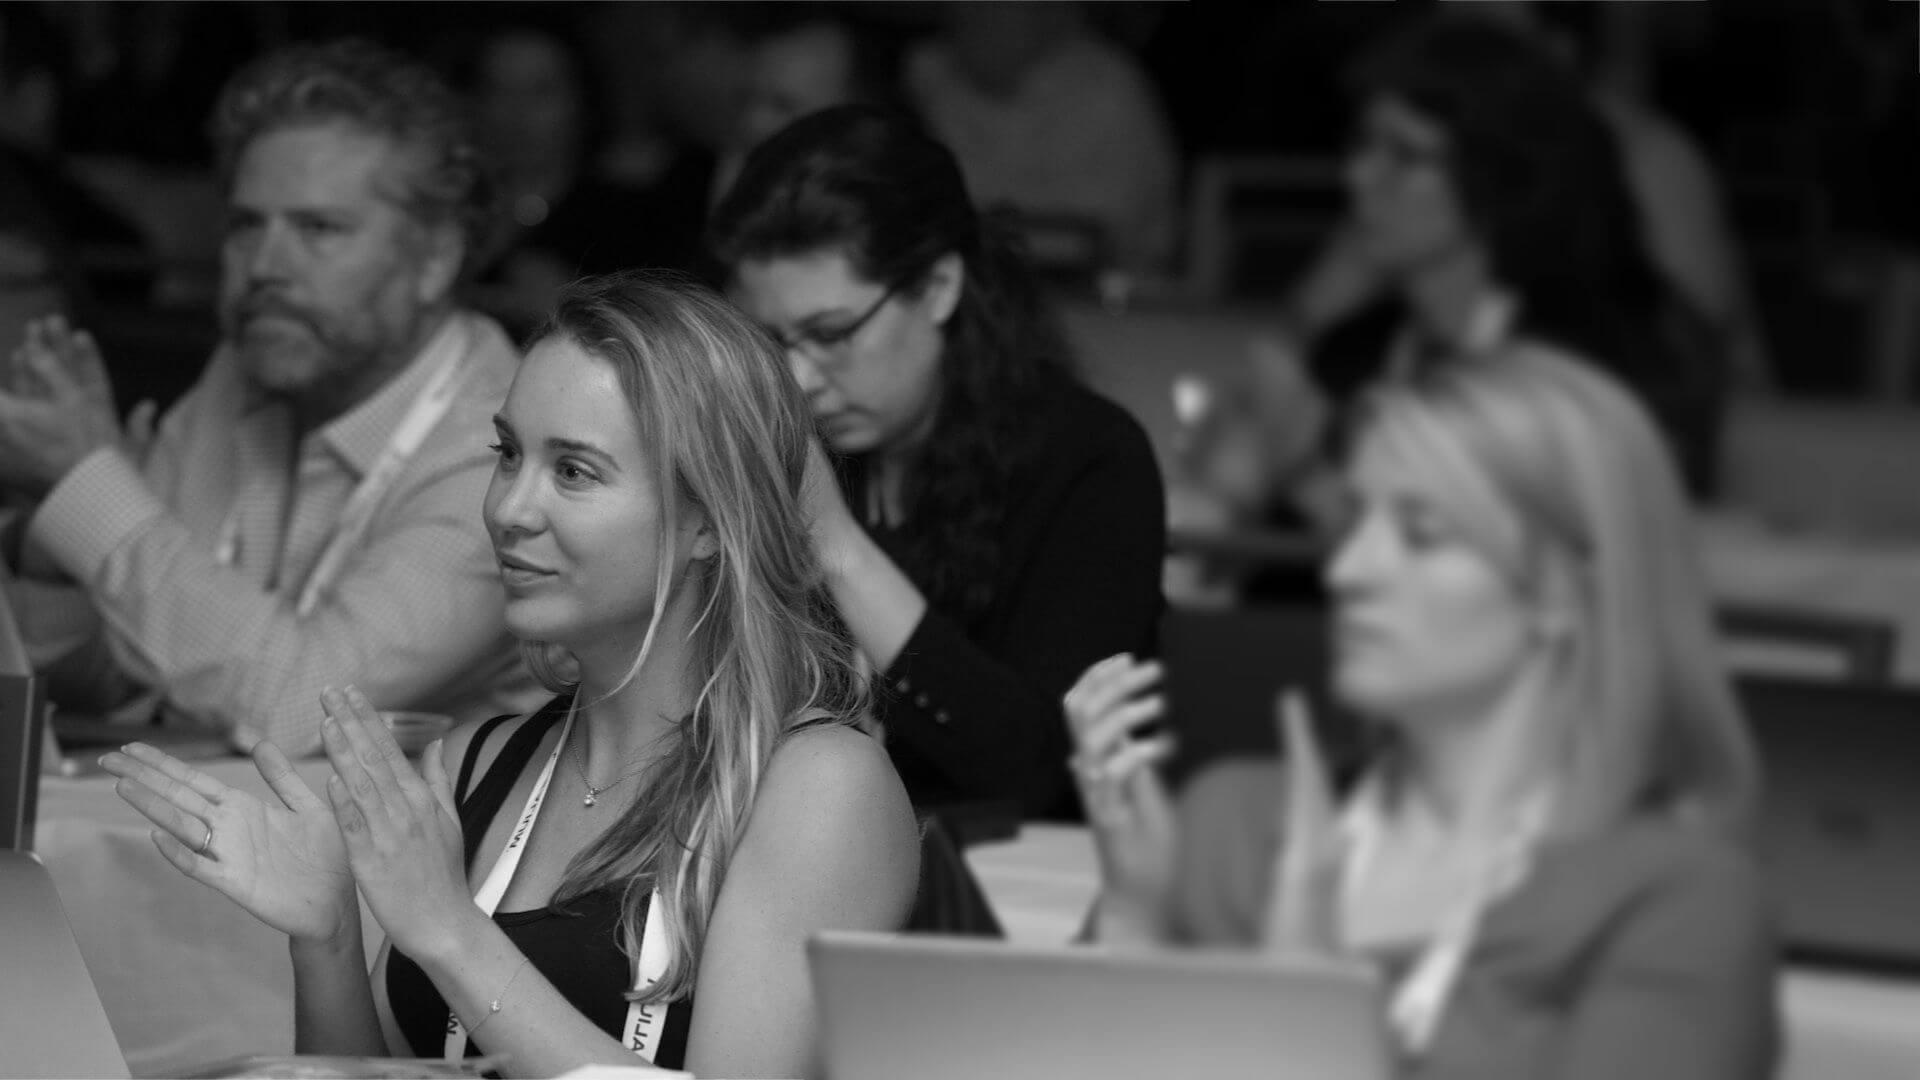 martech-workshops-=-real-experts,-actionable-tactics